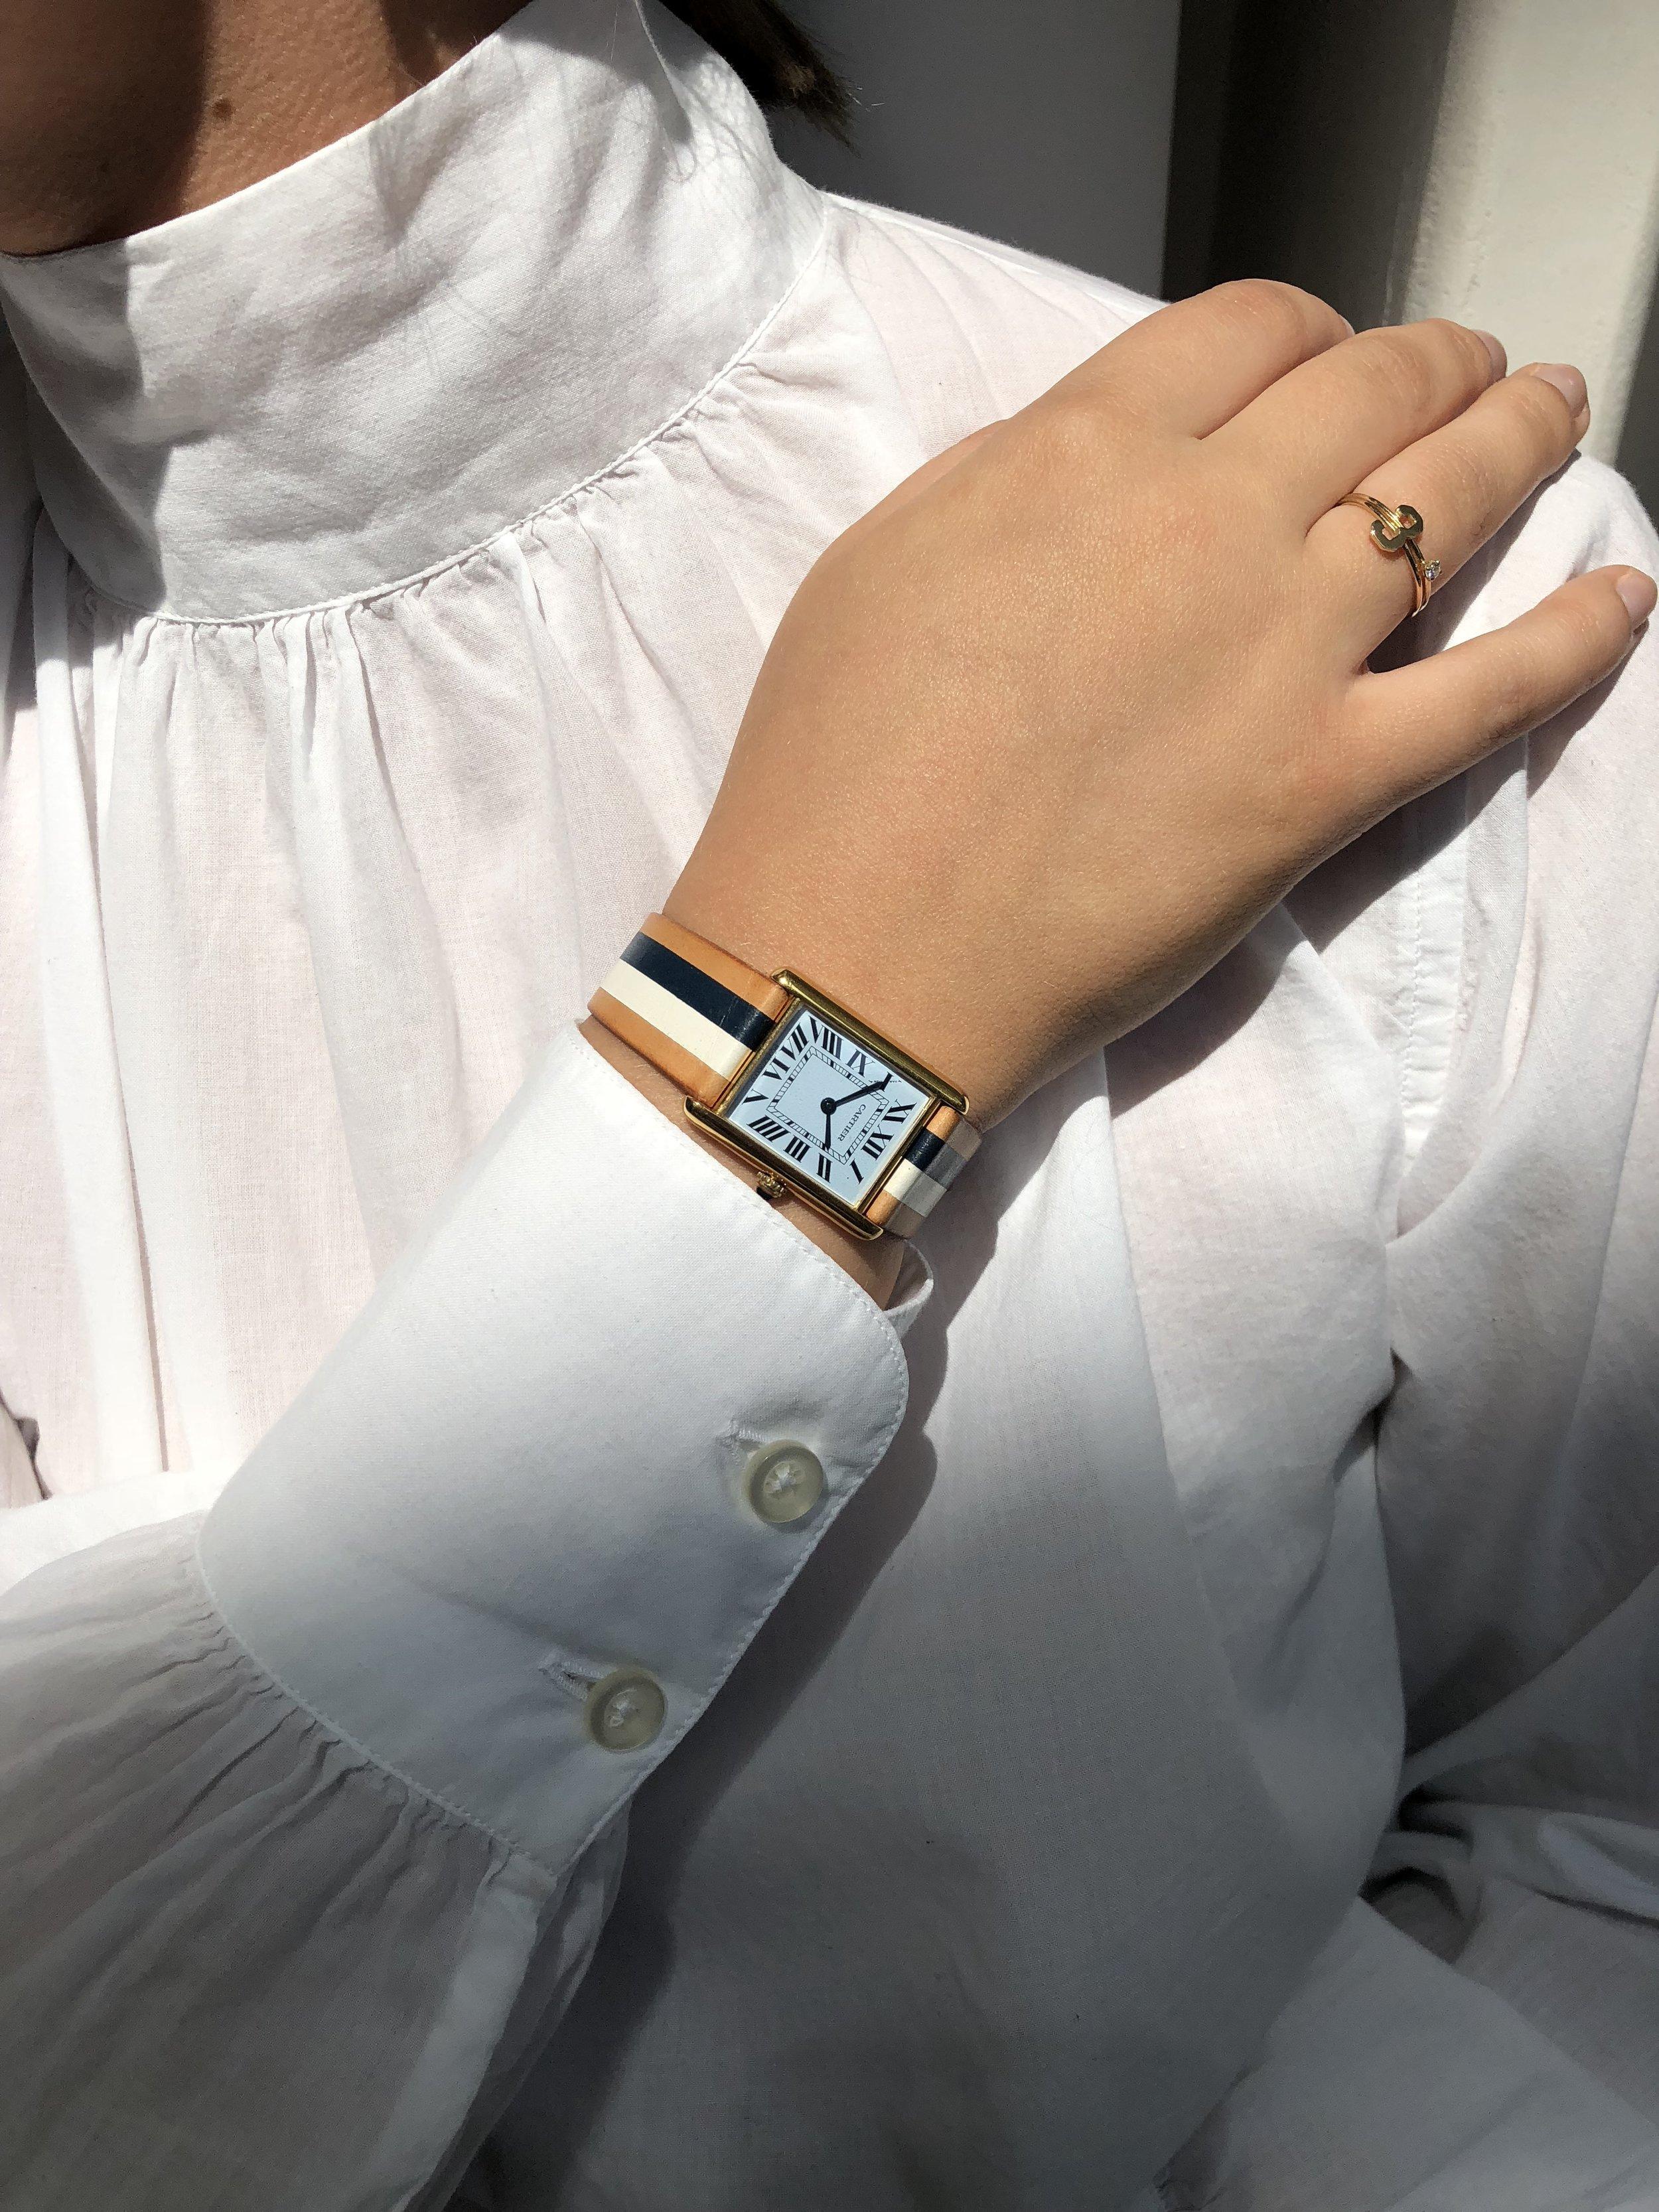 Favorite Item #2 - La californiennes re-worked vintage Cartier tank watch.